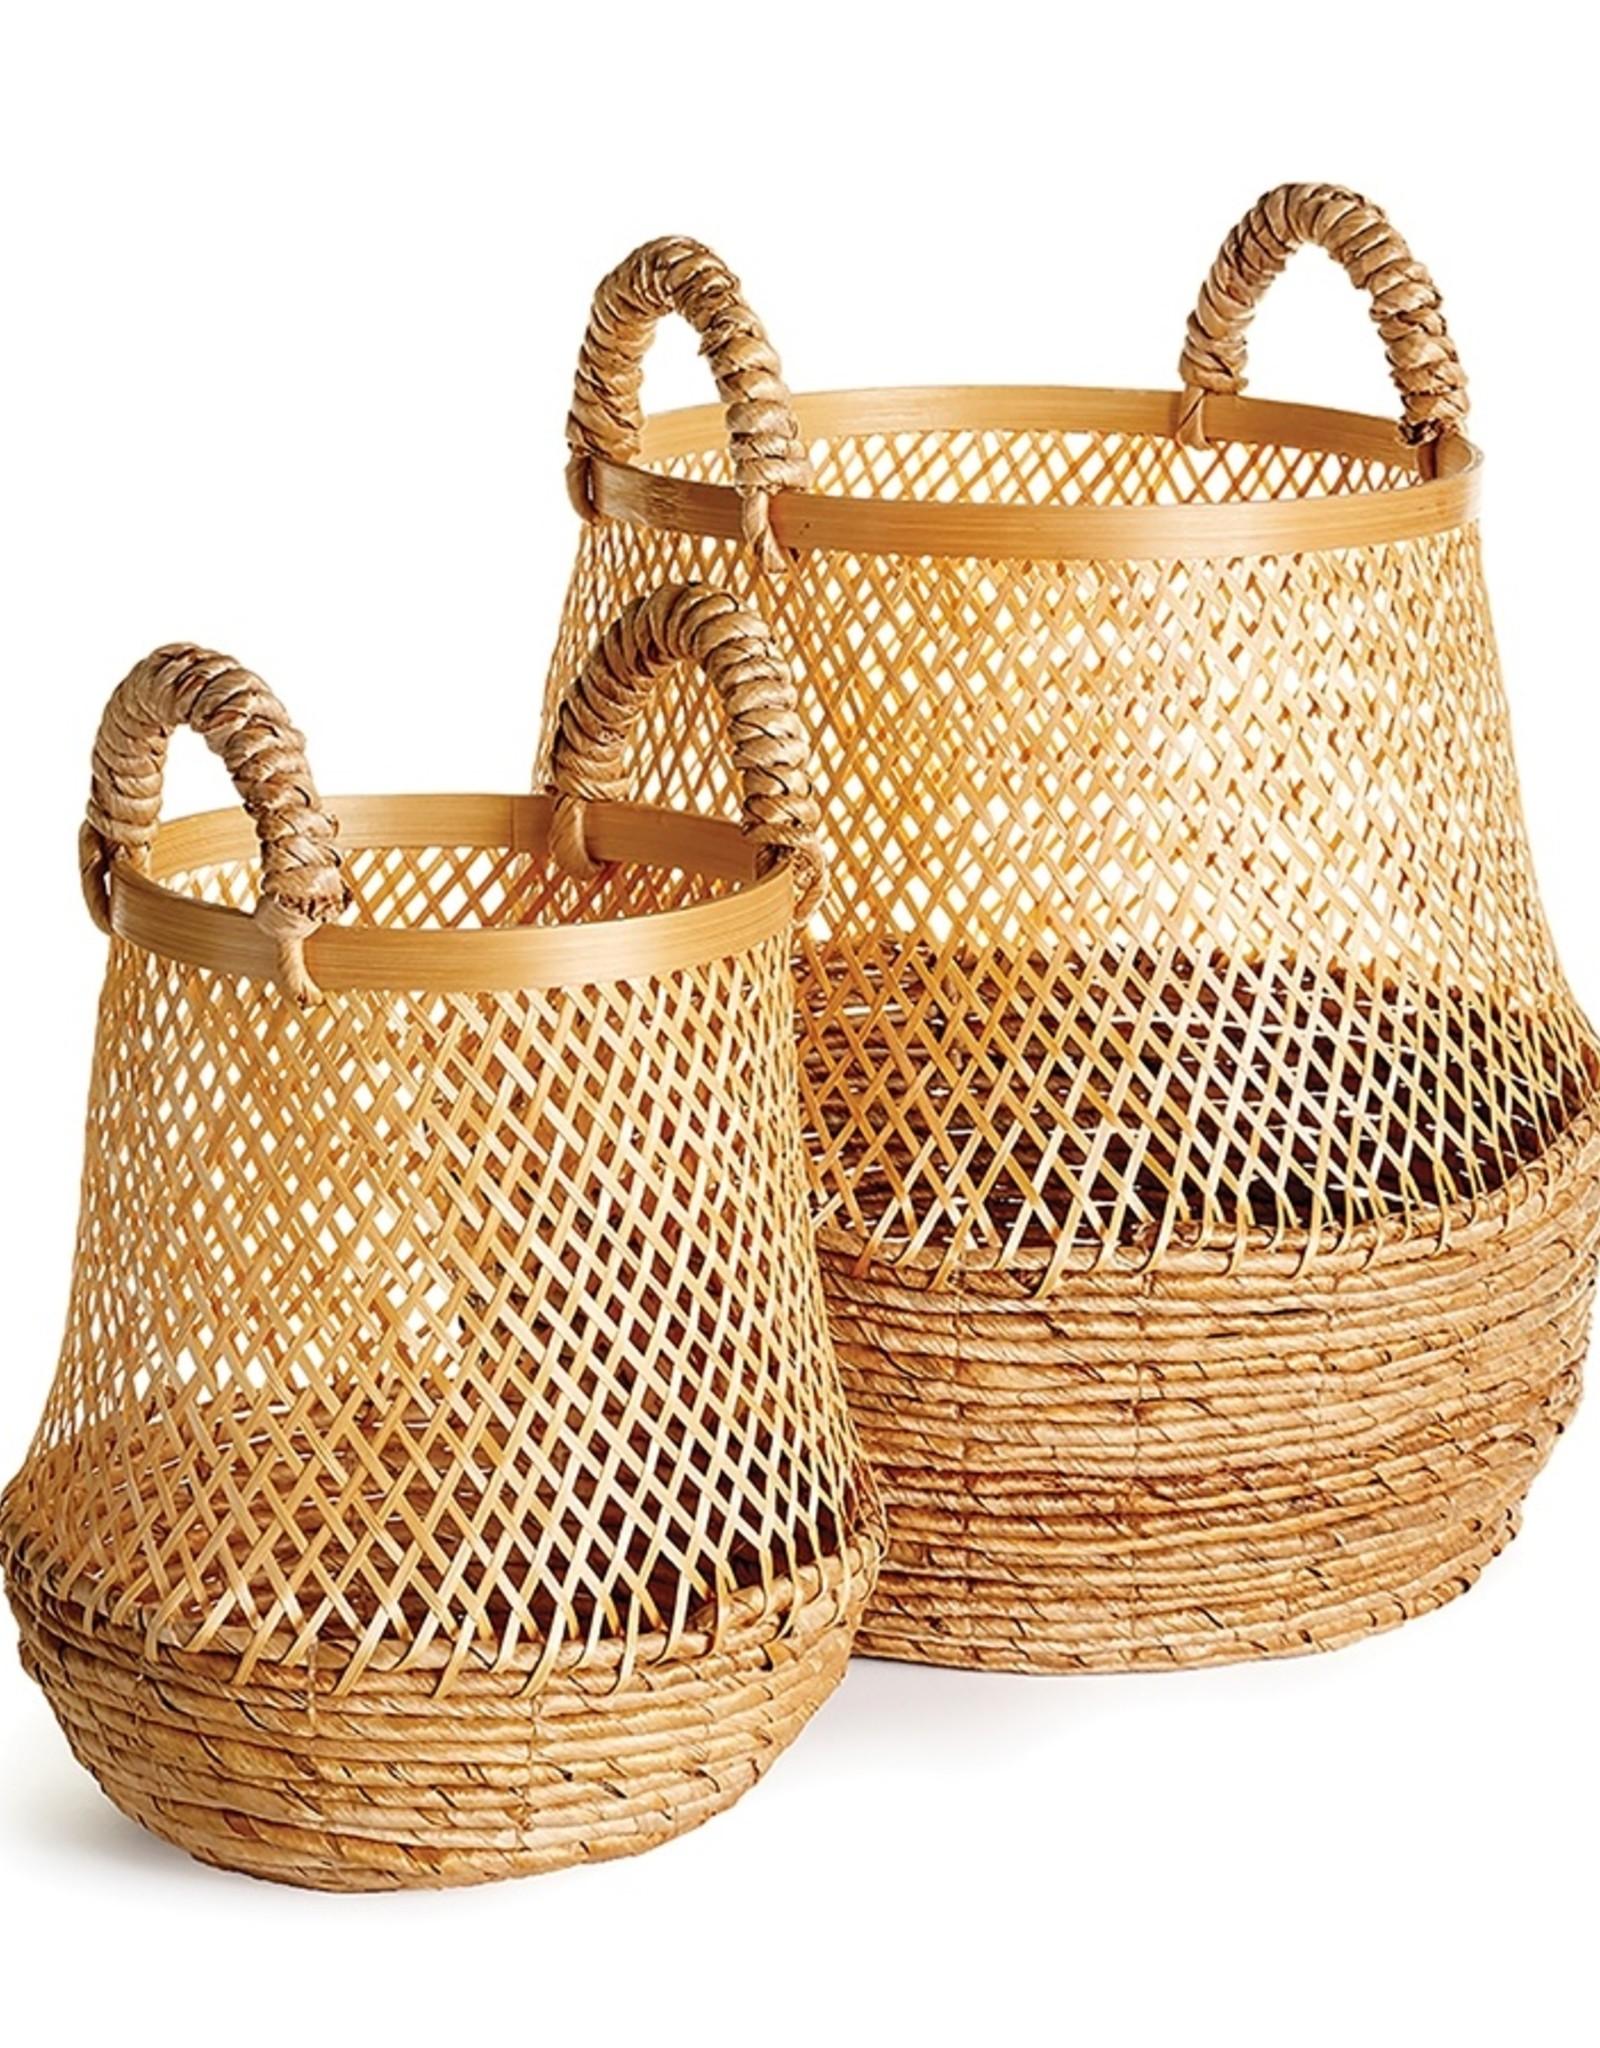 Napa Home and Garden Kolaka Belly Baskets